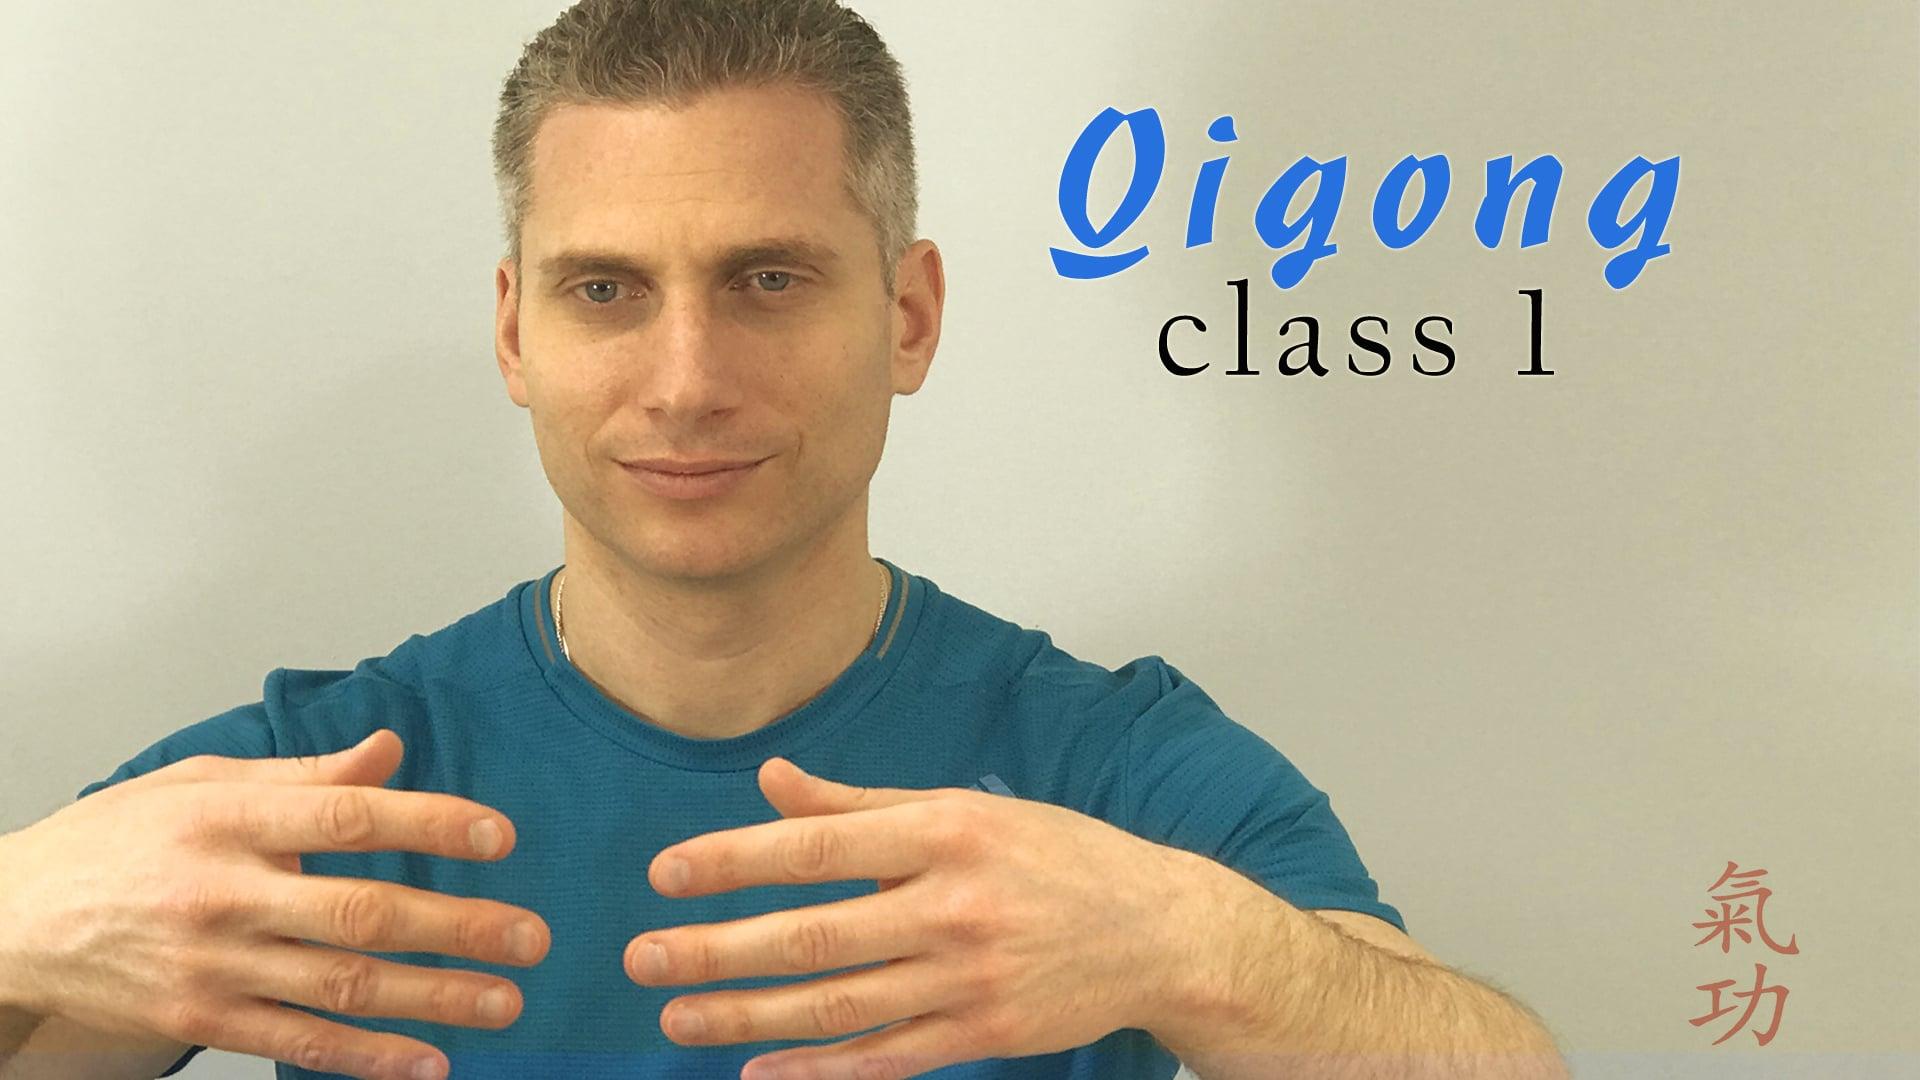 Qigong: Grounding and Balancing